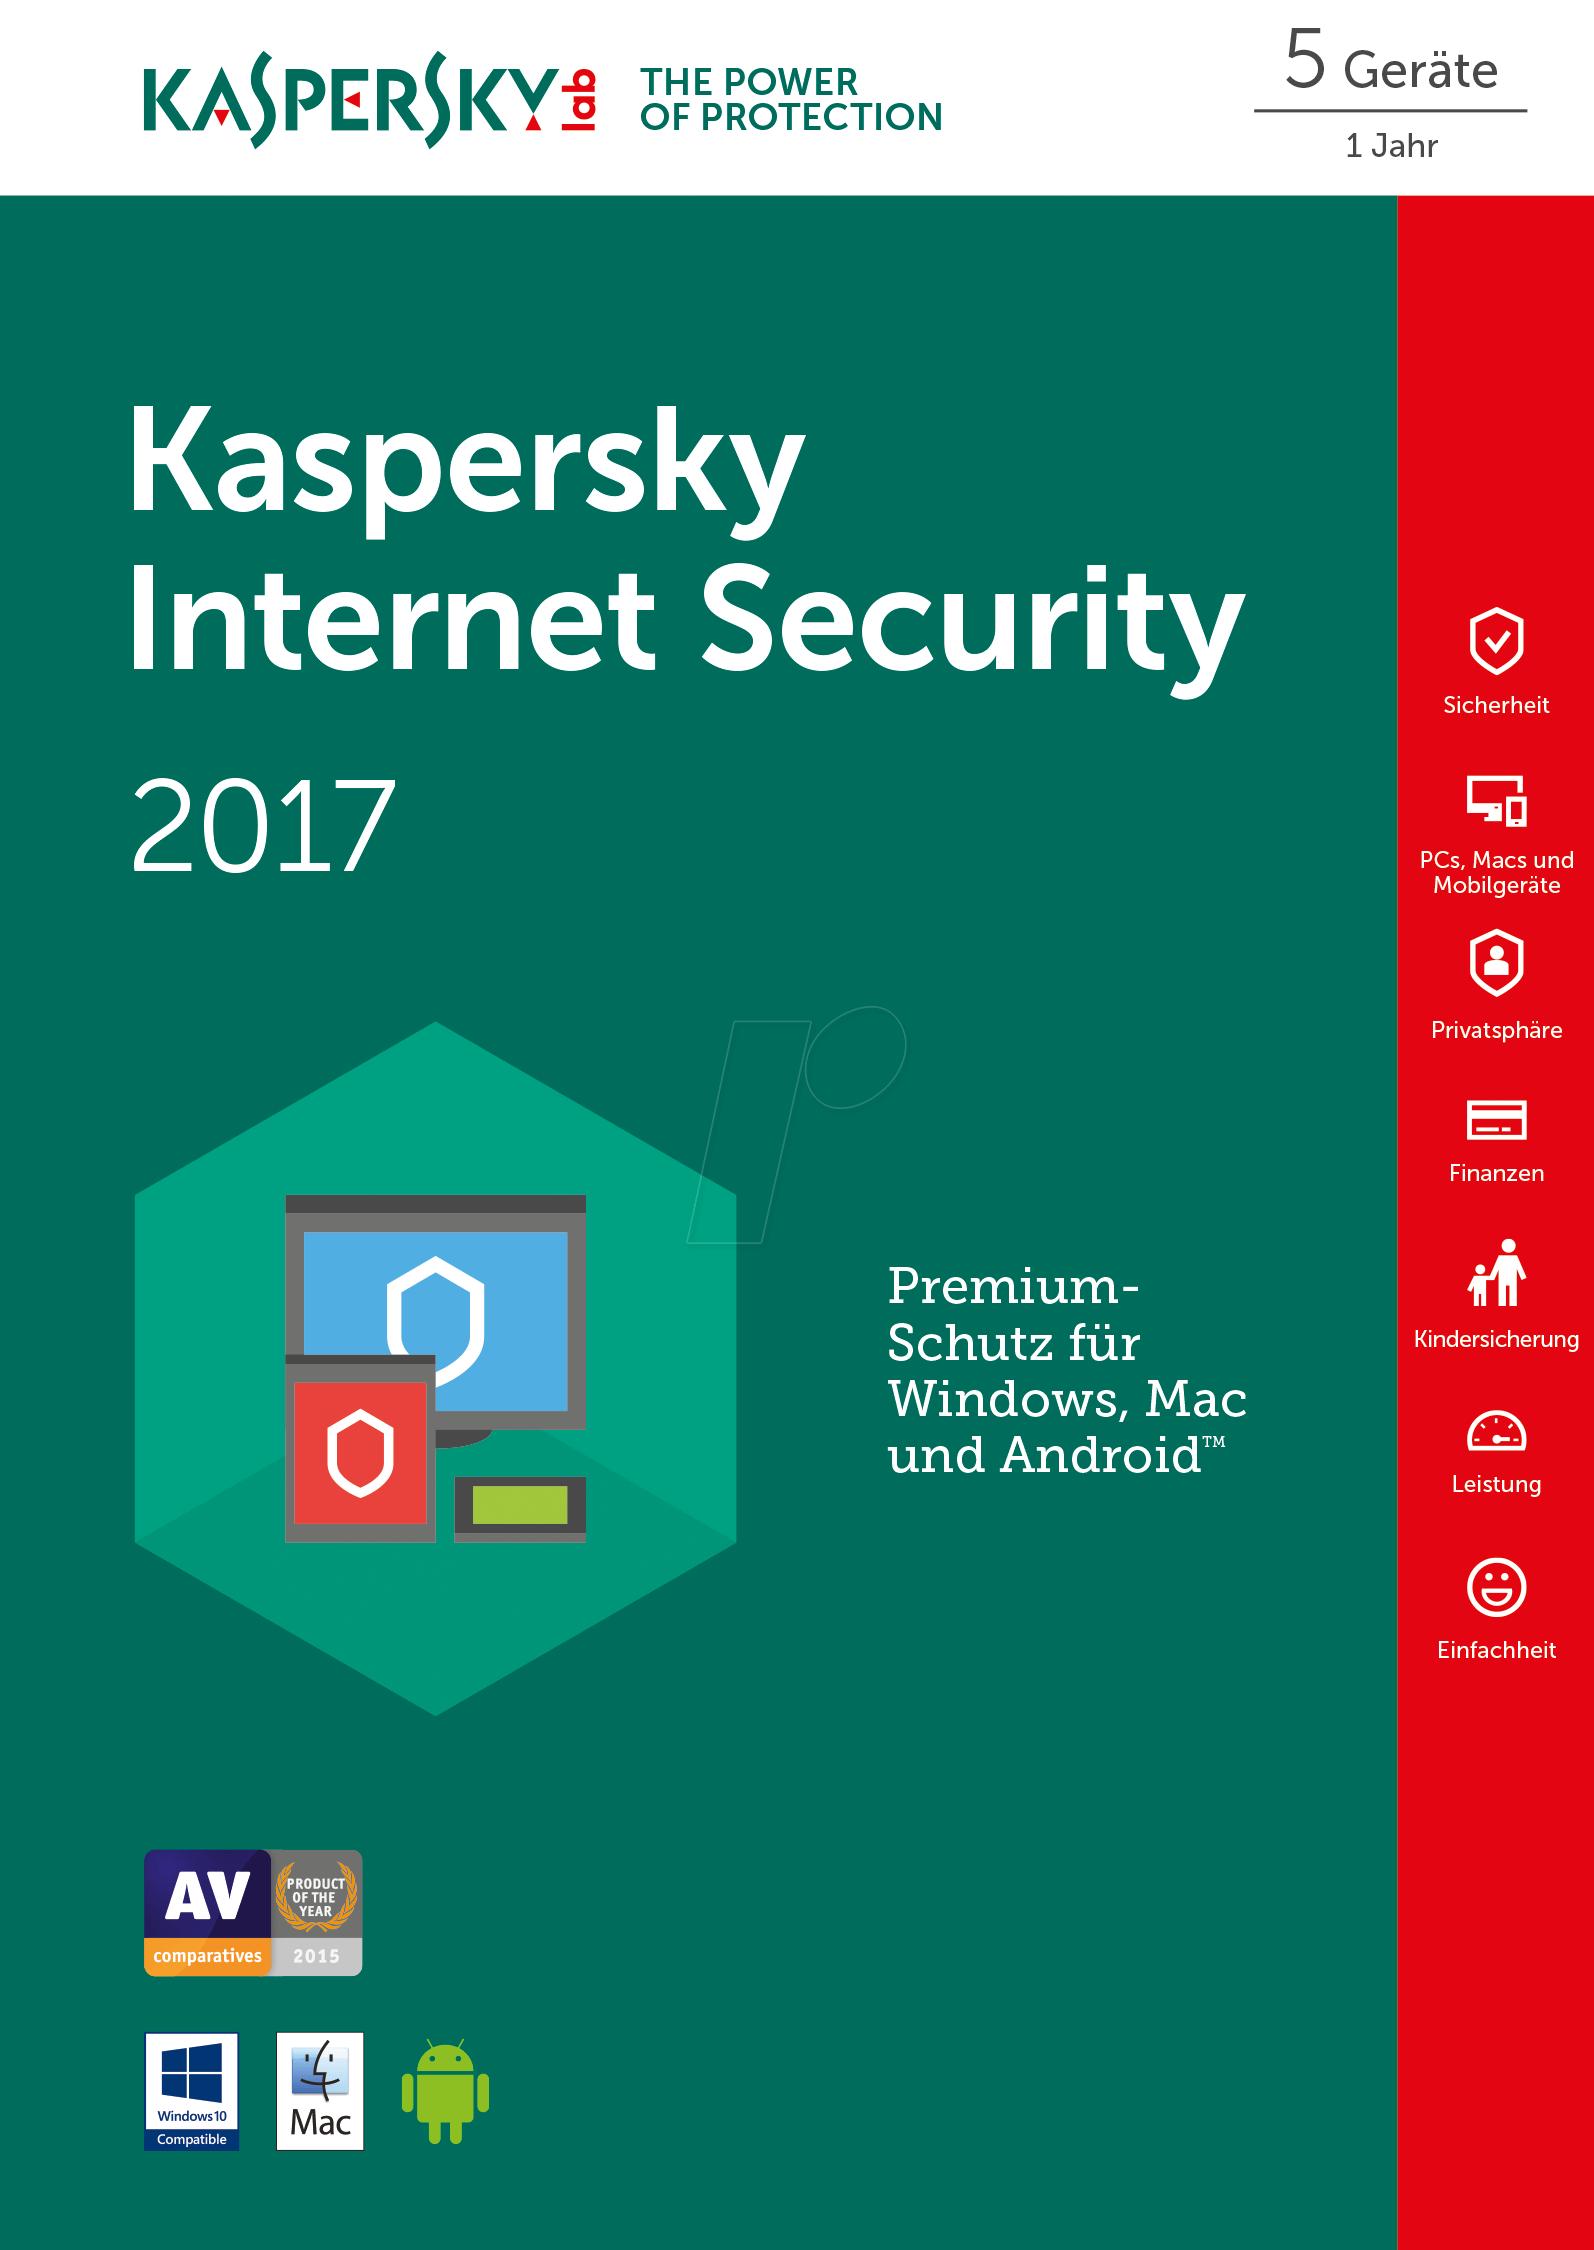 https://cdn-reichelt.de/bilder/web/xxl_ws/G500/KASPERSKY_IS2017_5U_02.png